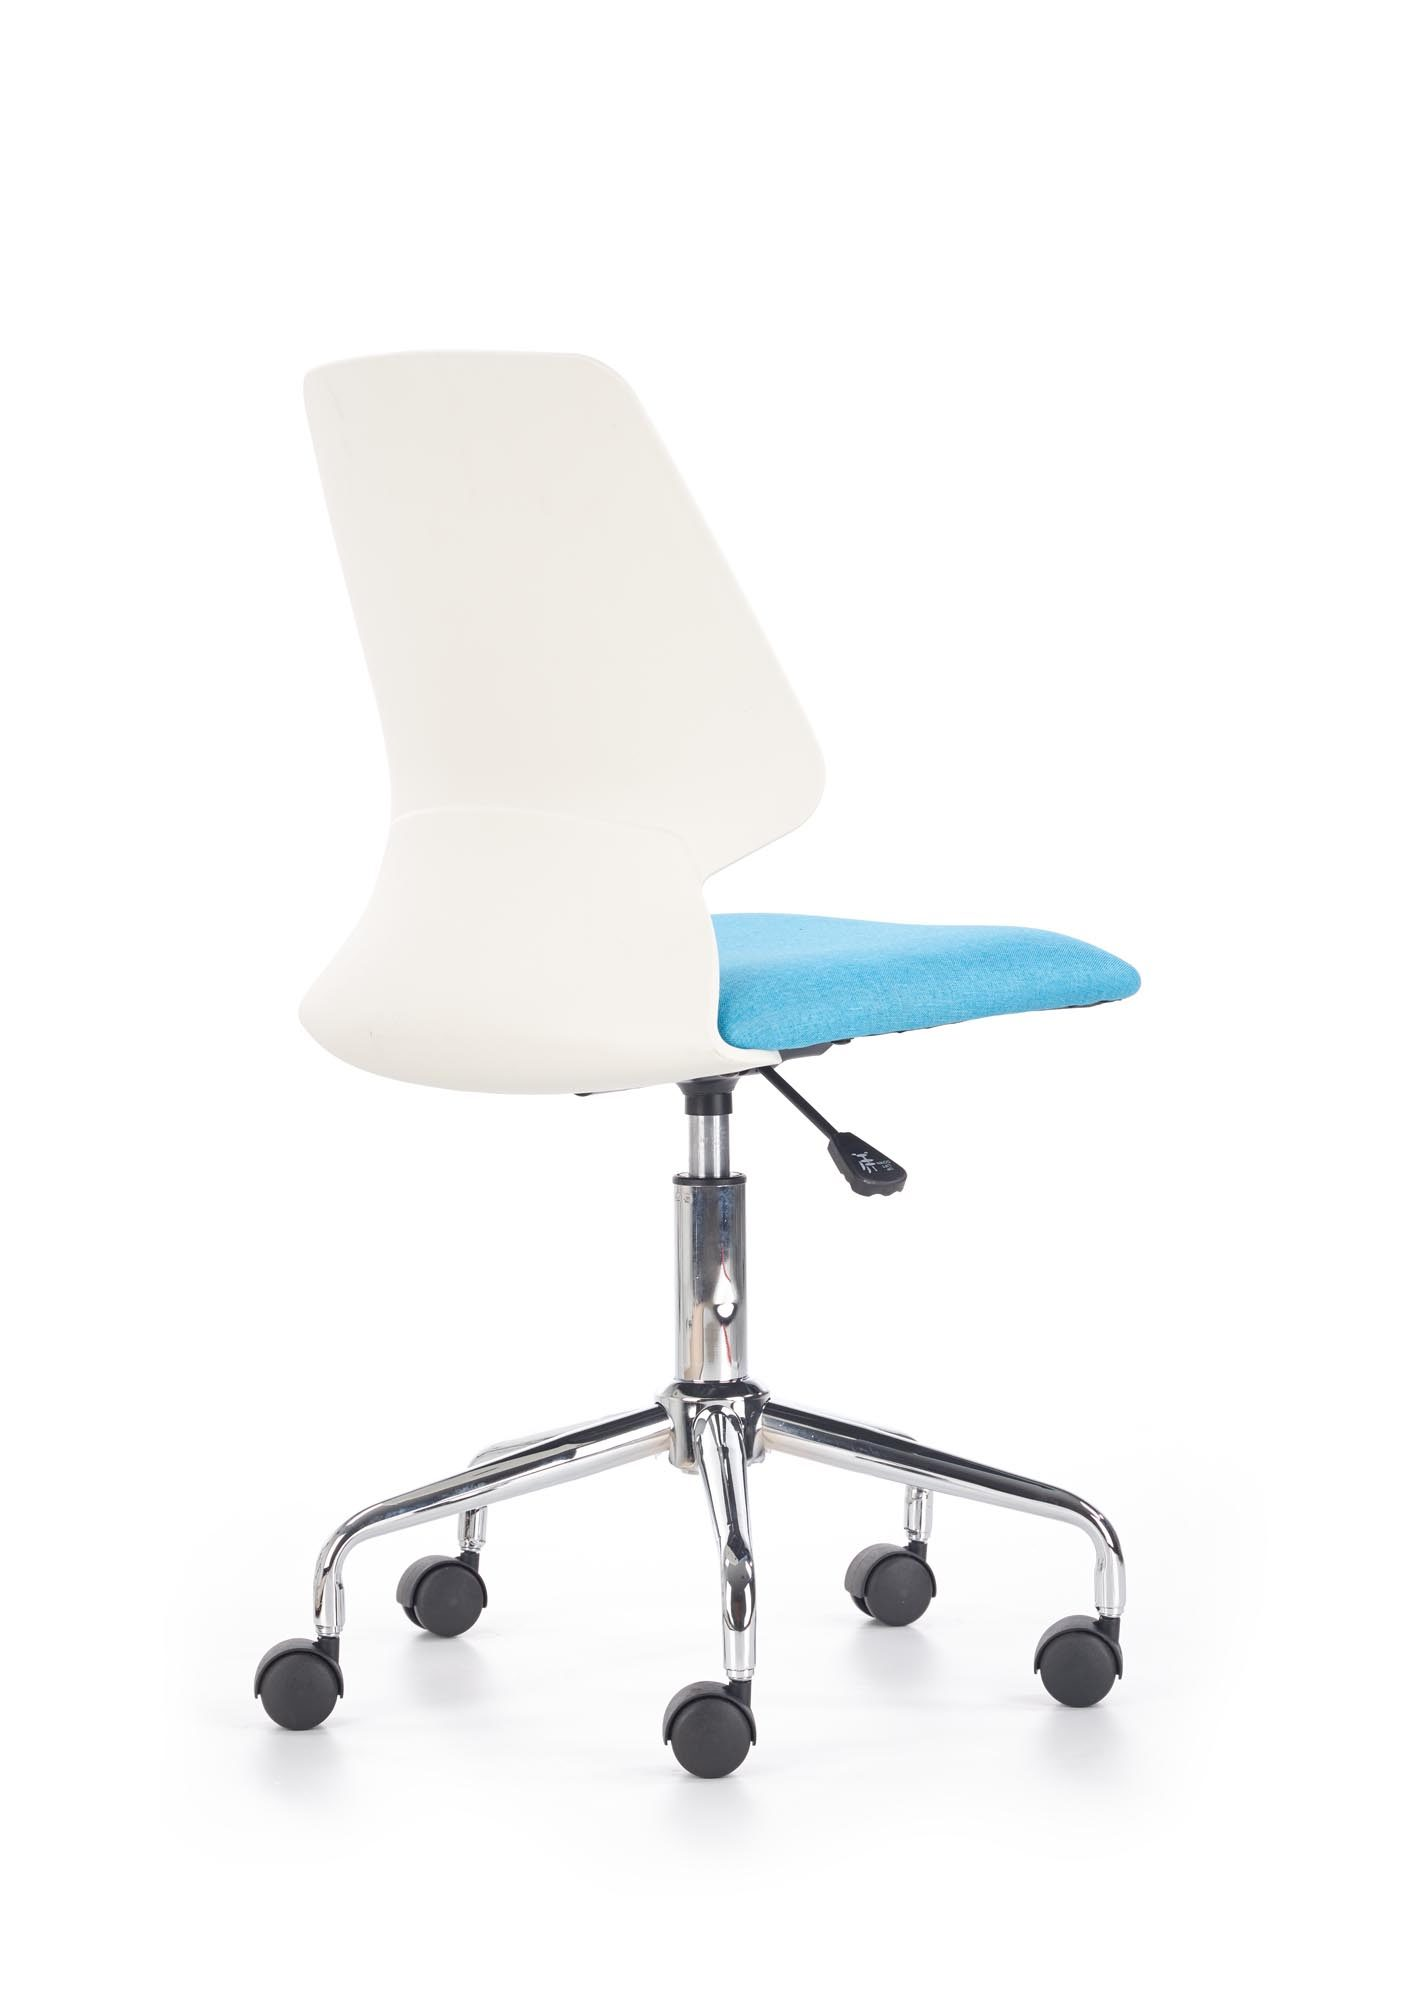 Dětská otočná židle Halmar SKATE modrá-bílá